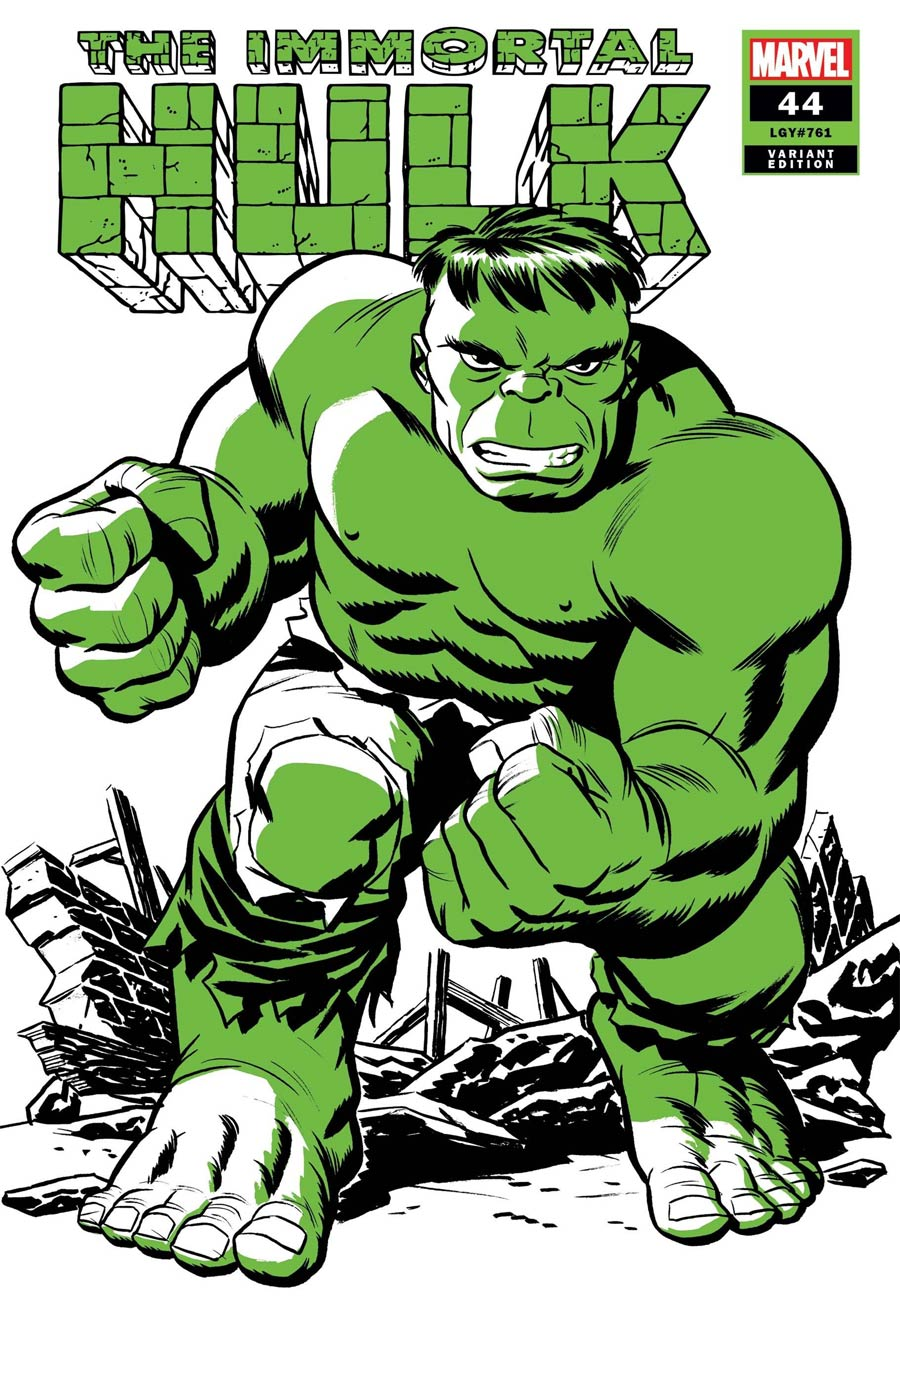 Immortal Hulk #44 Cover C Variant Michael Cho Hulk Two-Tone Cover